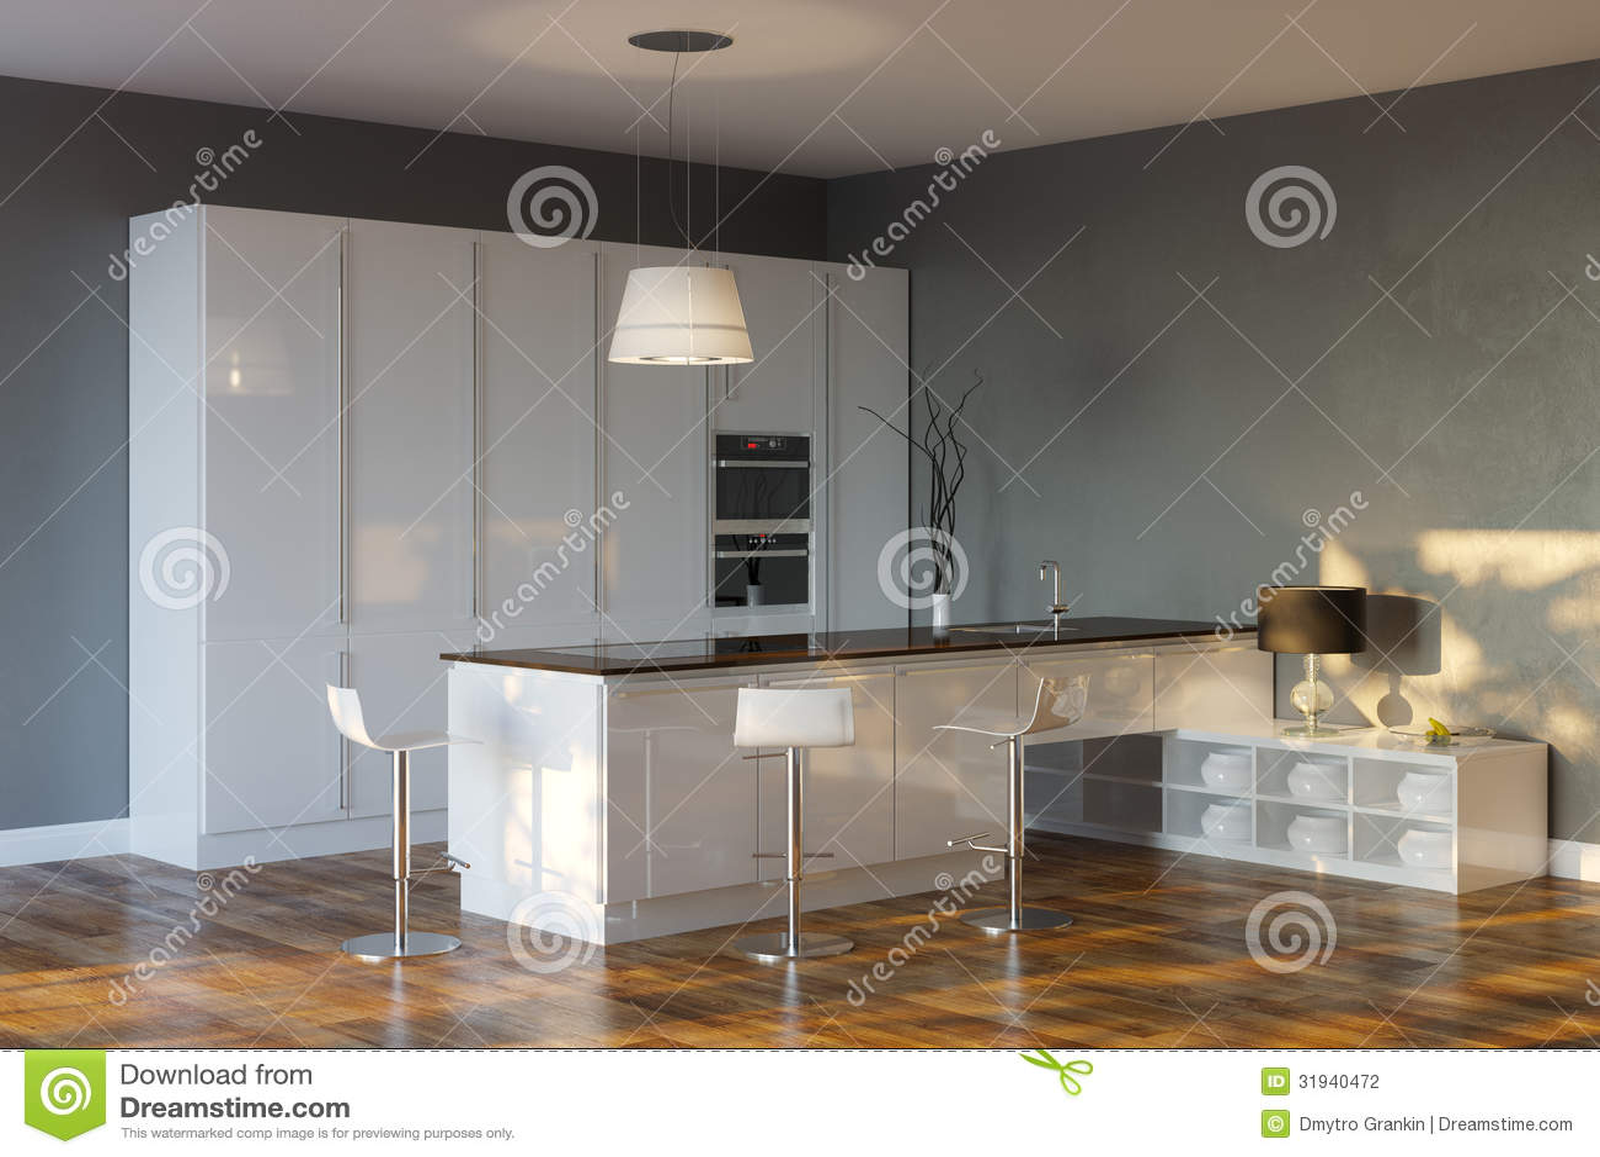 Luxehi-tech Keuken met Grey Walls And Bar